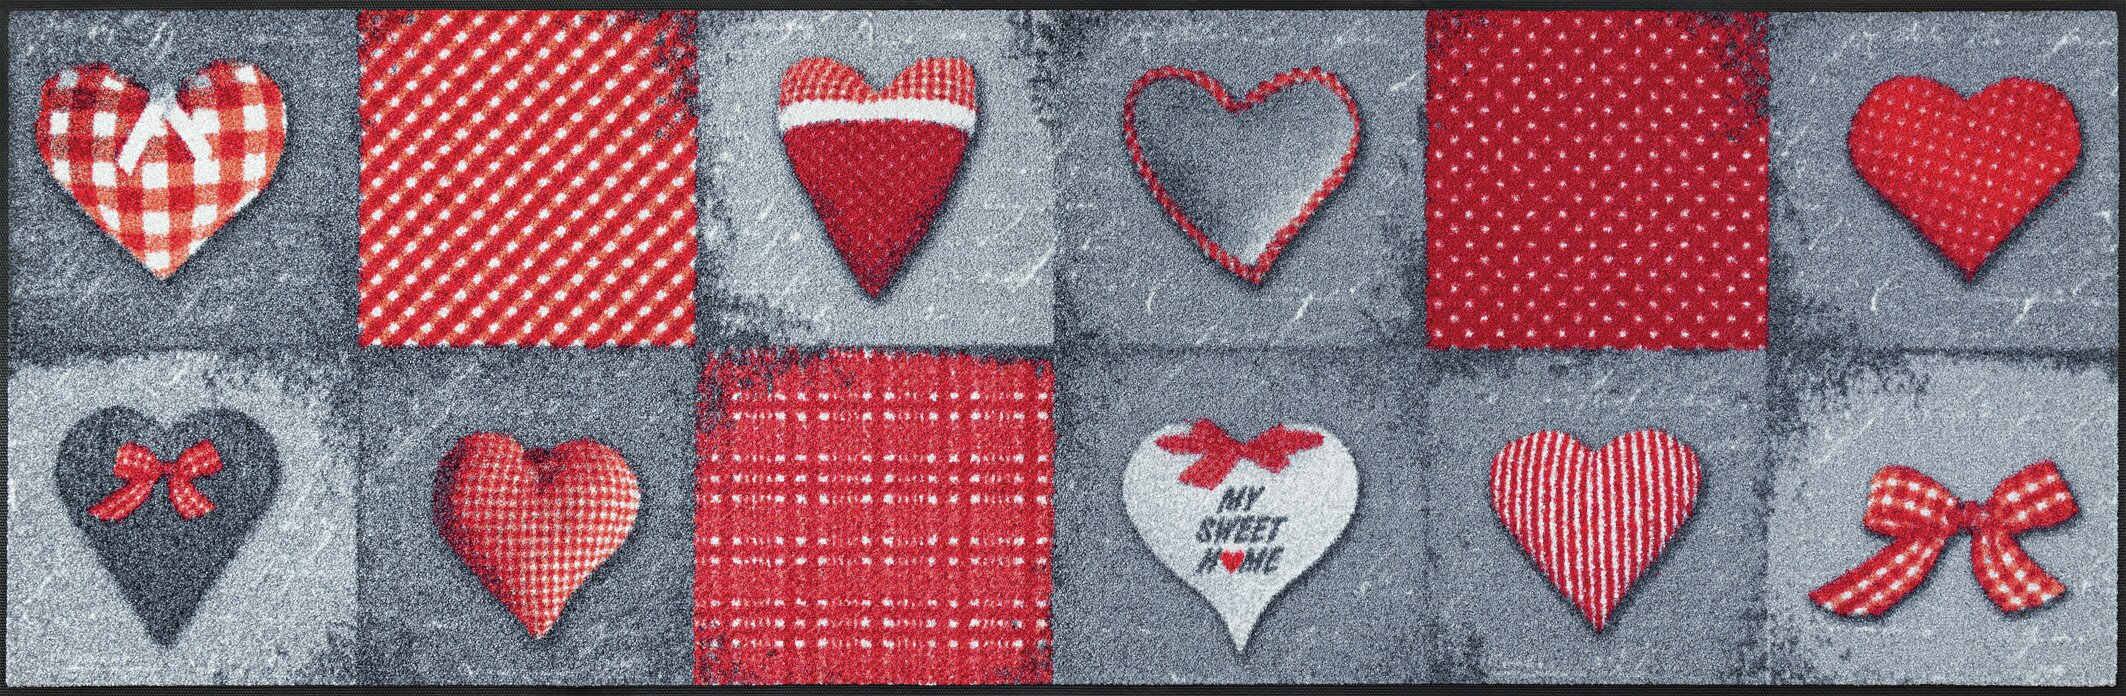 Wash+dry My Sweet Home Doormat & Reviews | Wayfair.co.uk